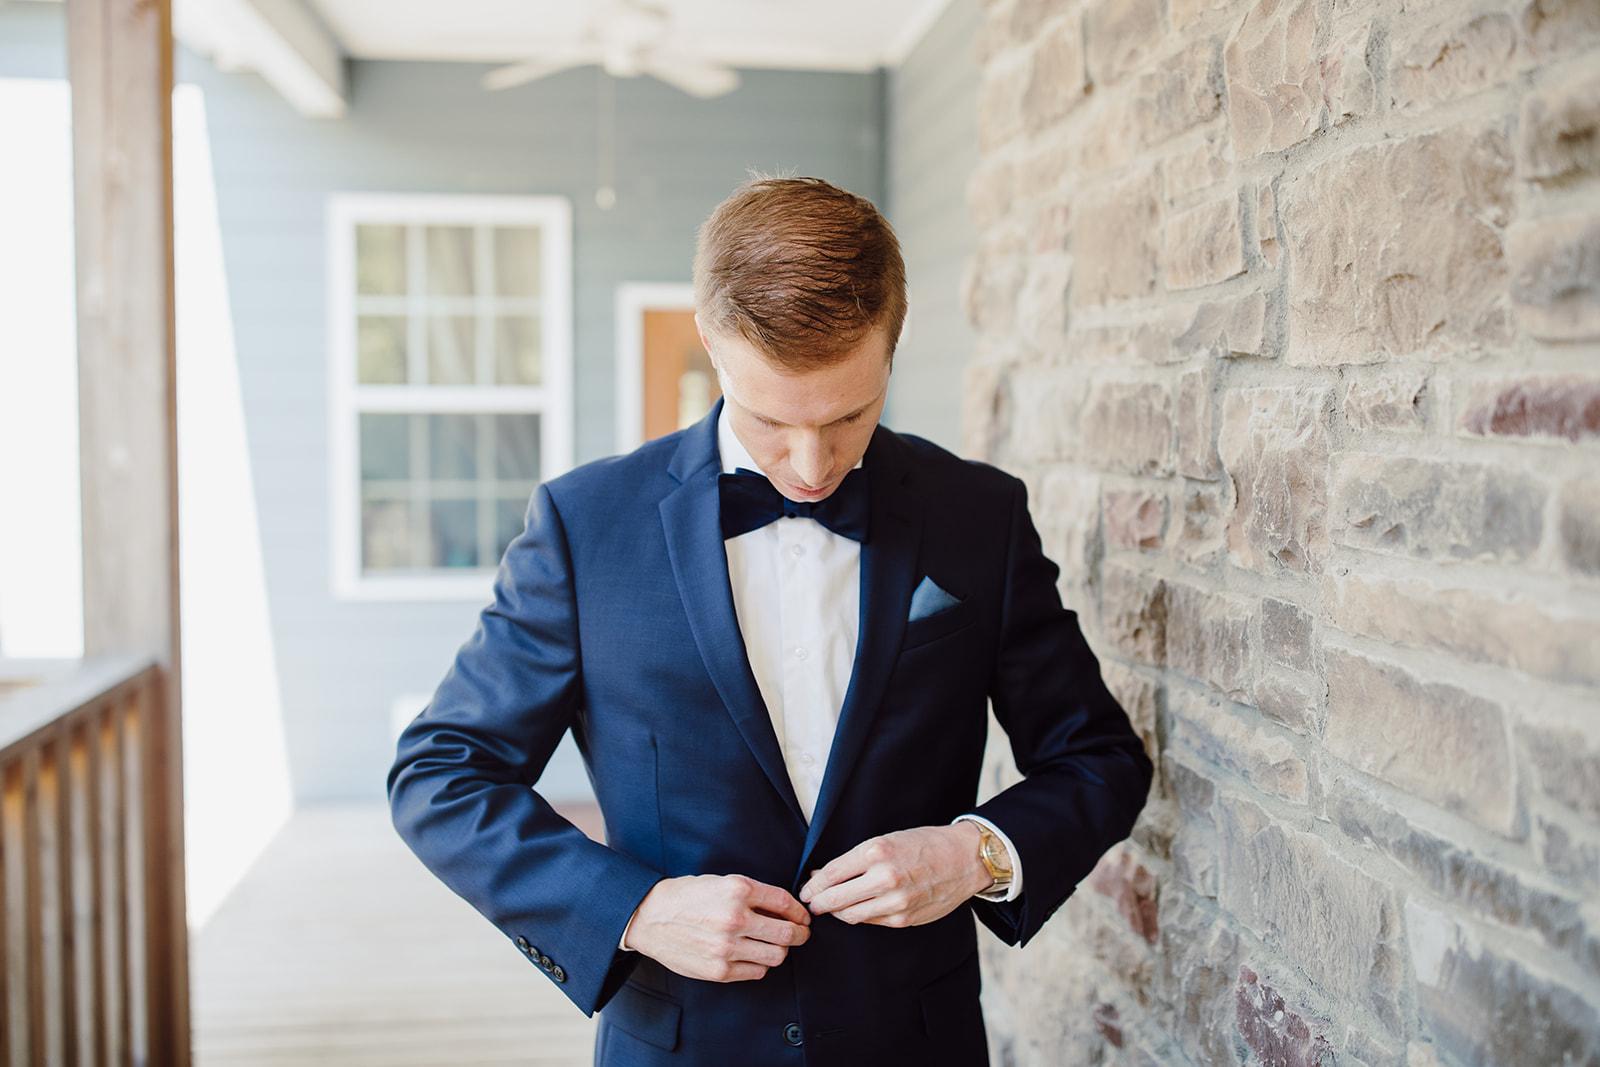 Blue wedding tuxedo with bowtie